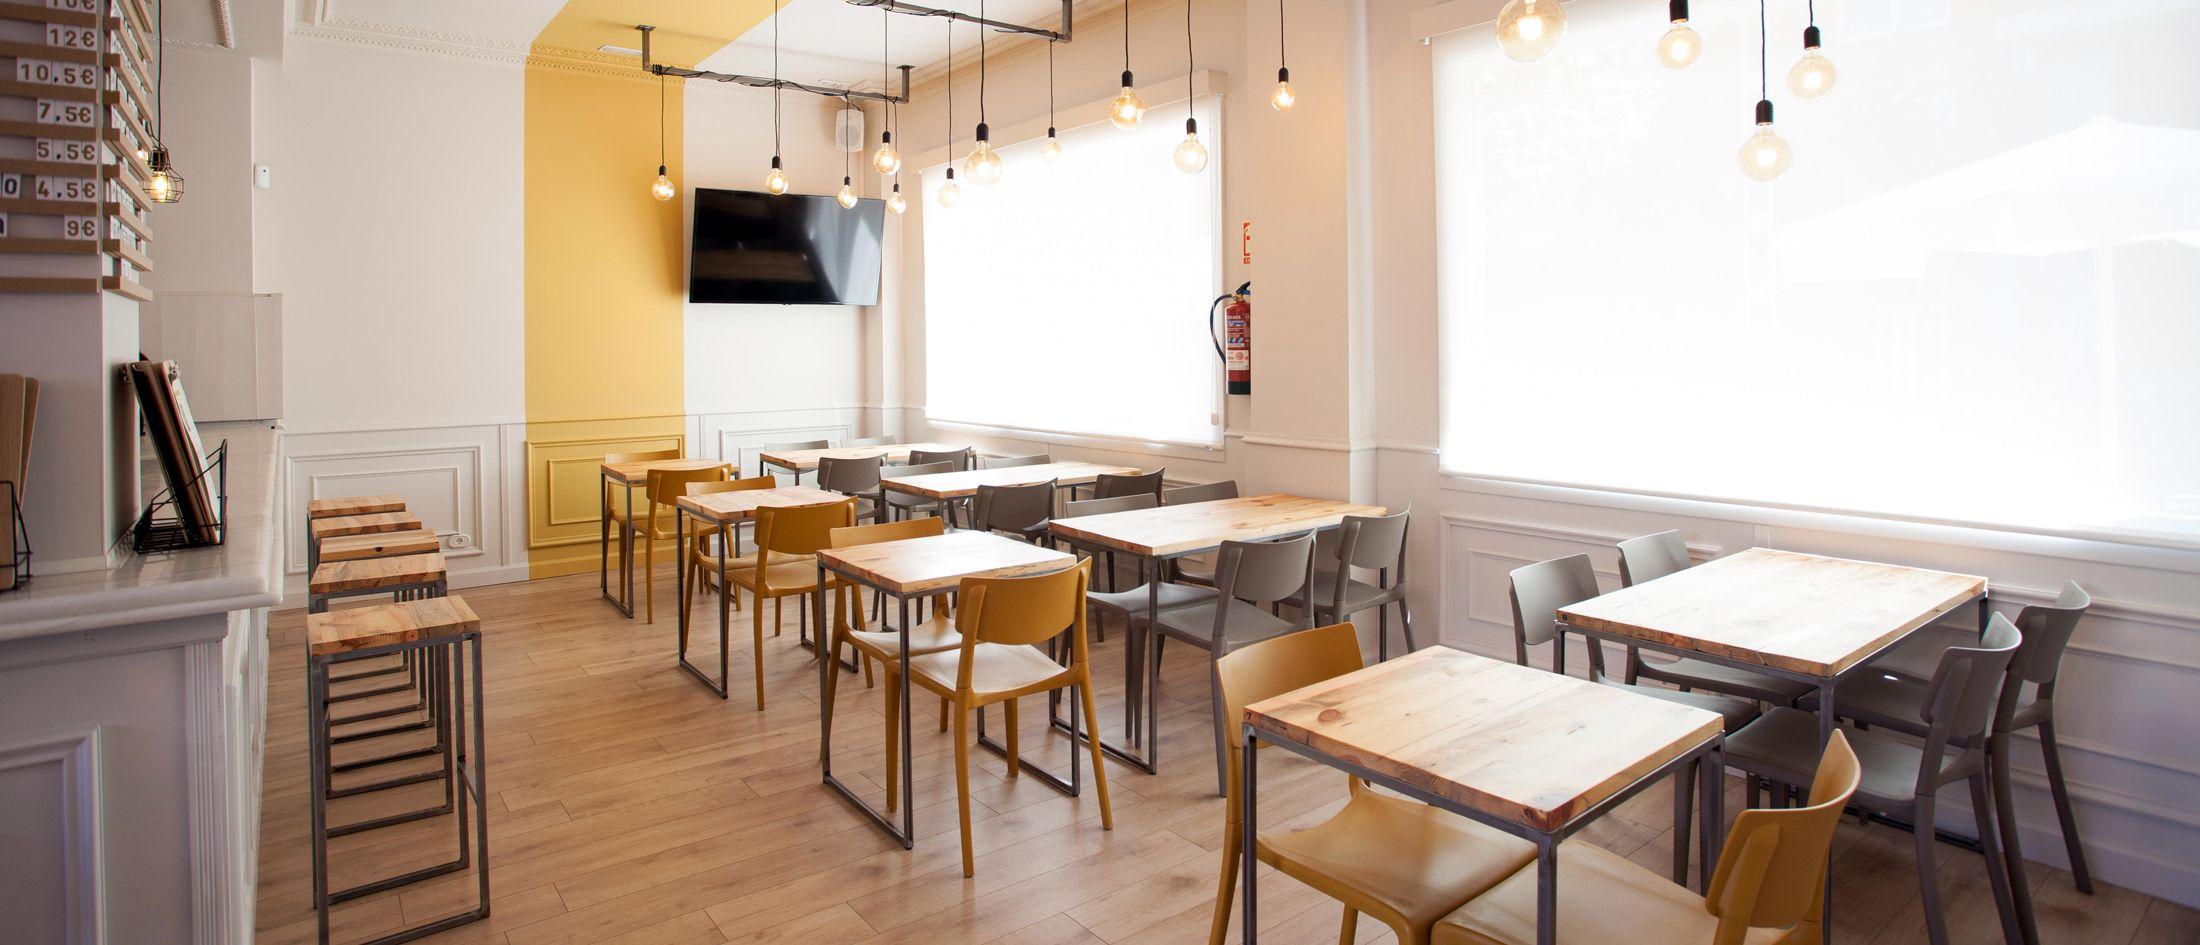 Interiorismo ampliación bar restaurante Ampliamos concepto actual bar copas abriendo envolvente local patio trasero diferencia singularidad punto fuerte proyecto | Perspectiva Moma